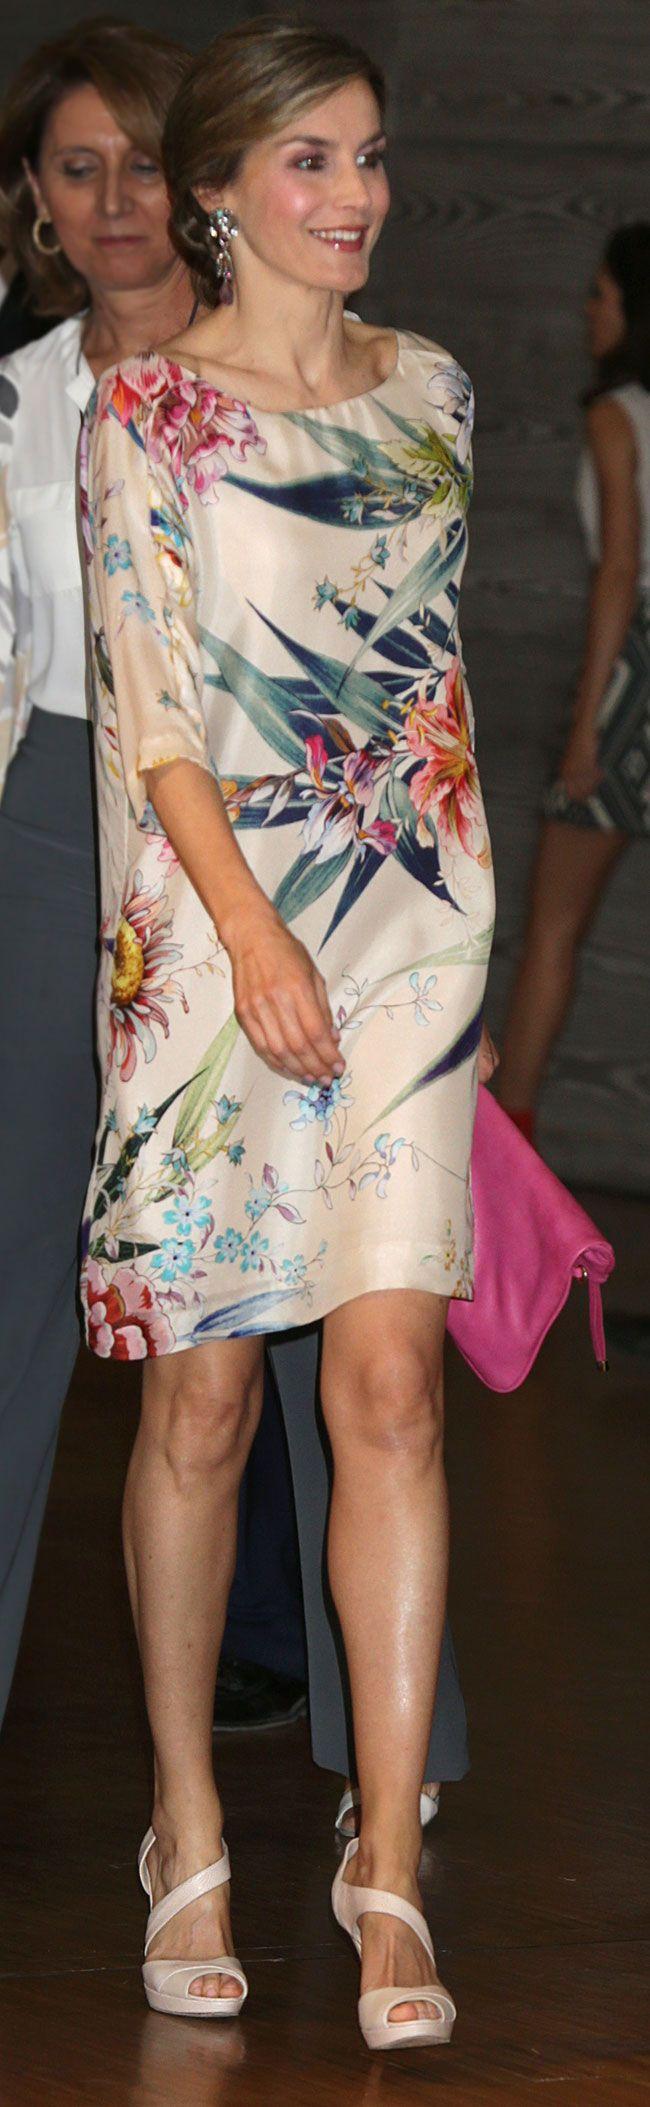 Queen Letizia attends National Fashion Awards 2015